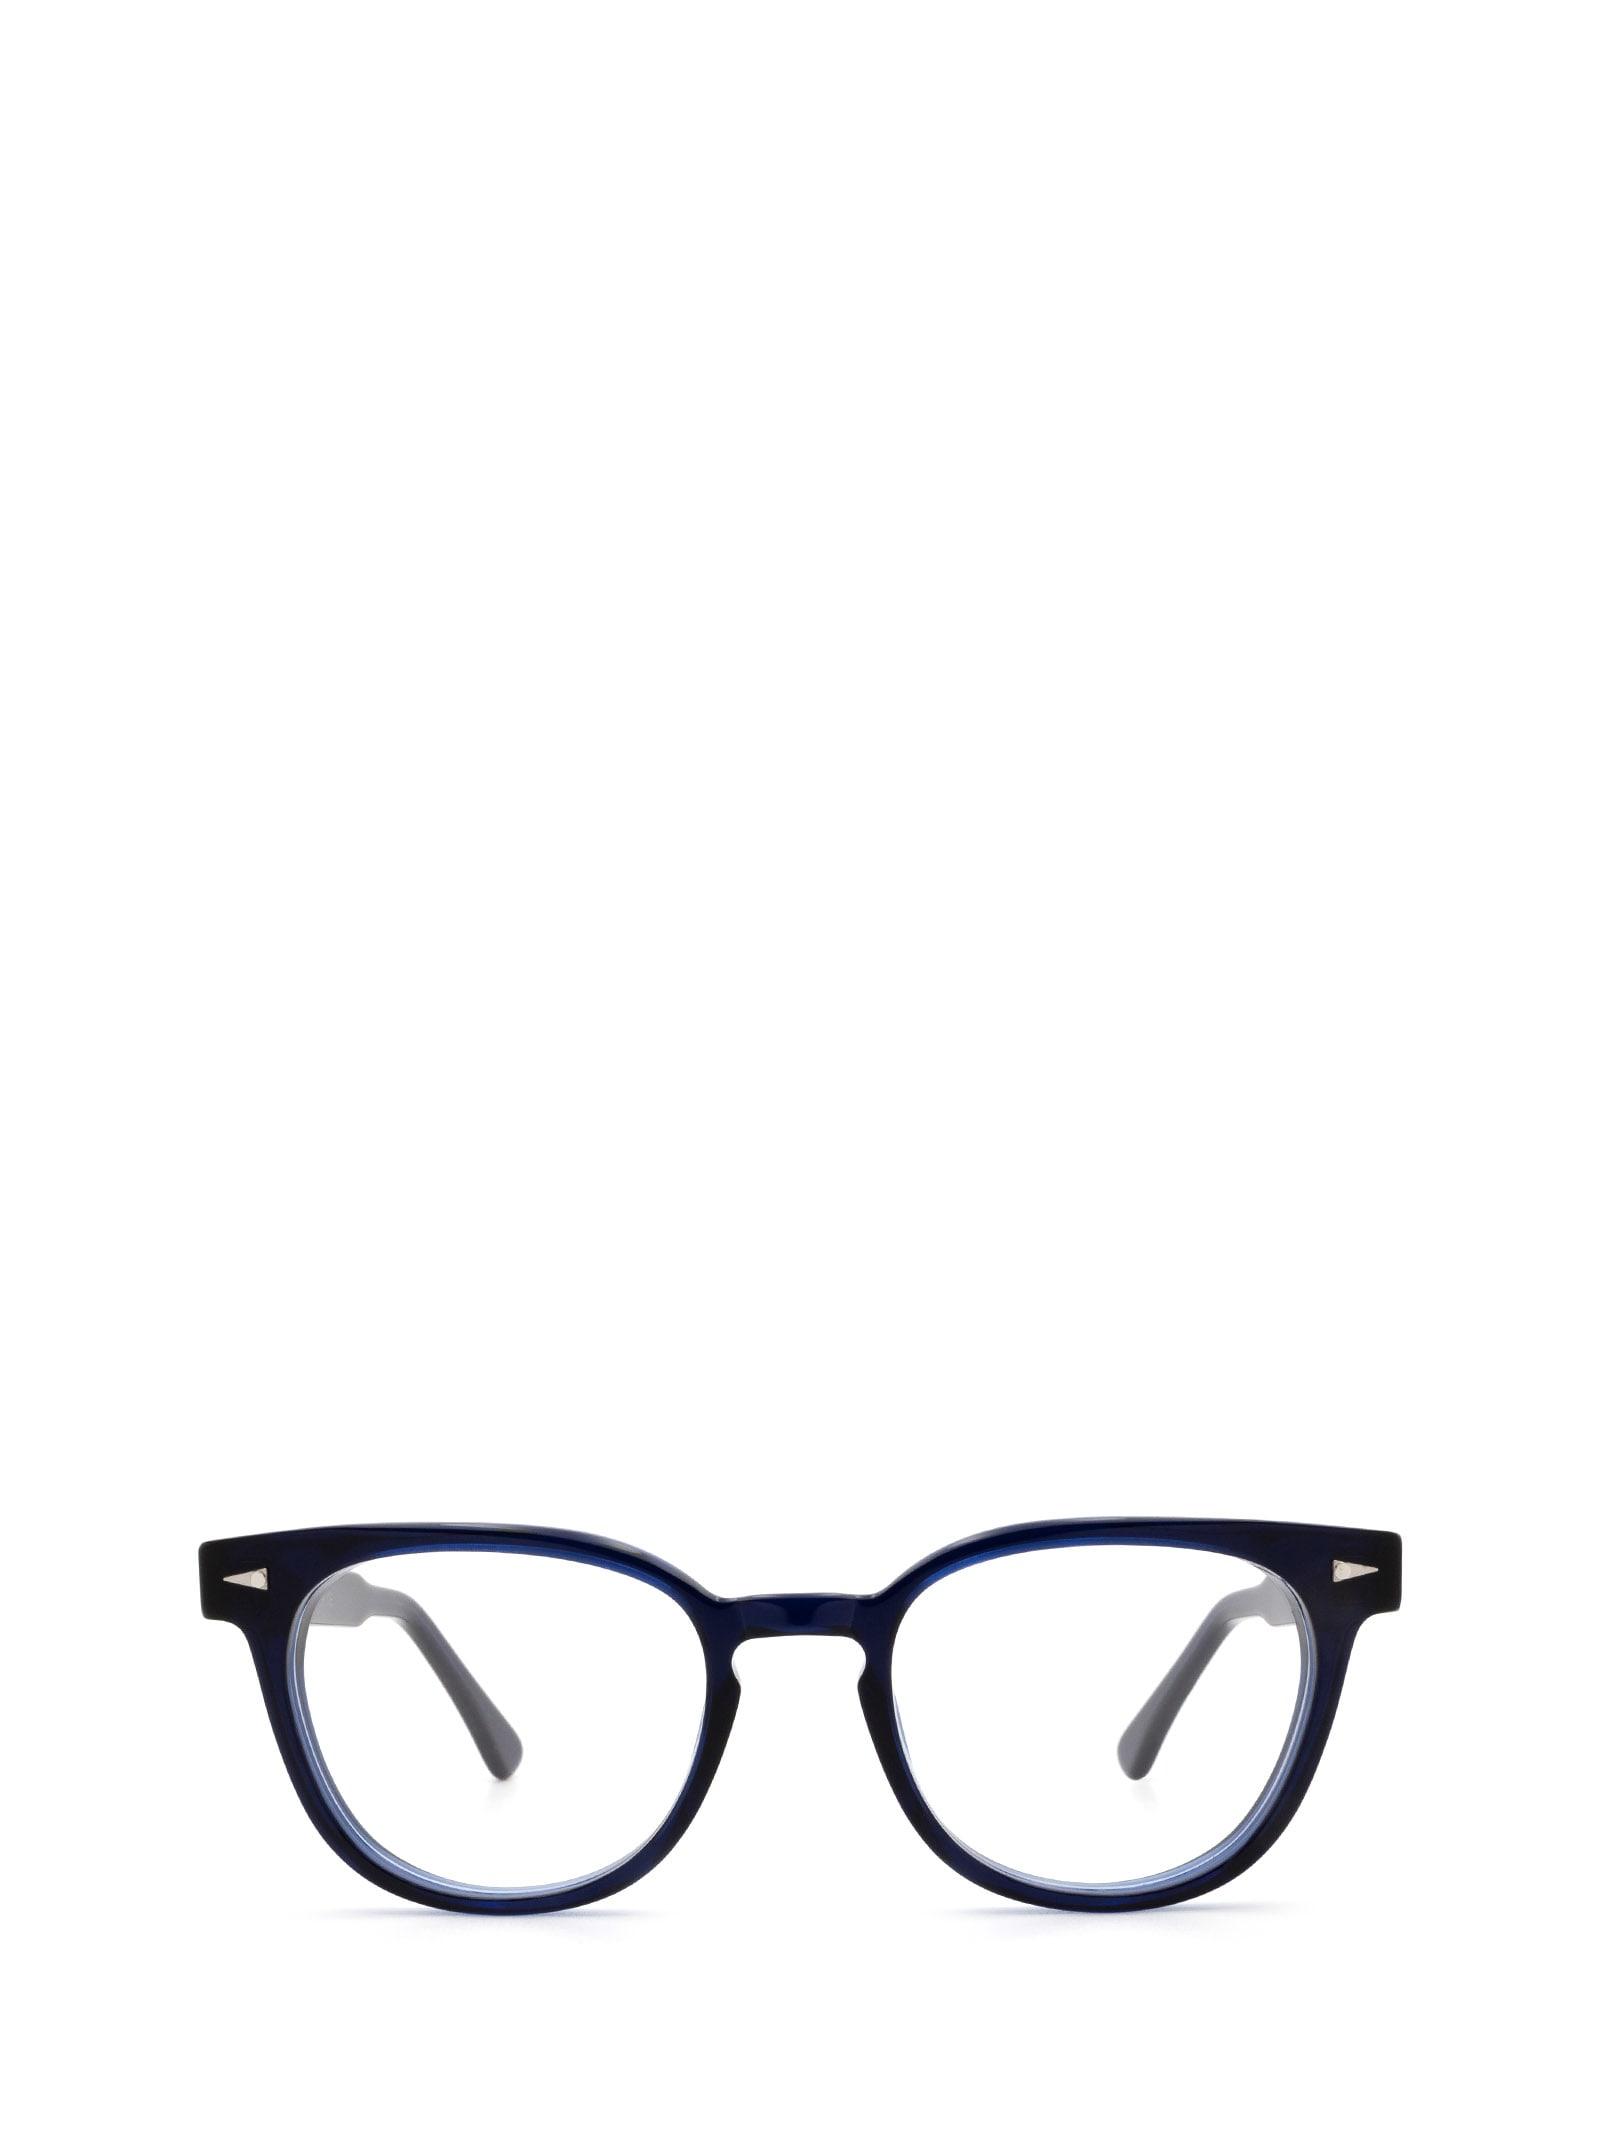 AHLEM Ahlem Rue Duroc Bluelight Glasses